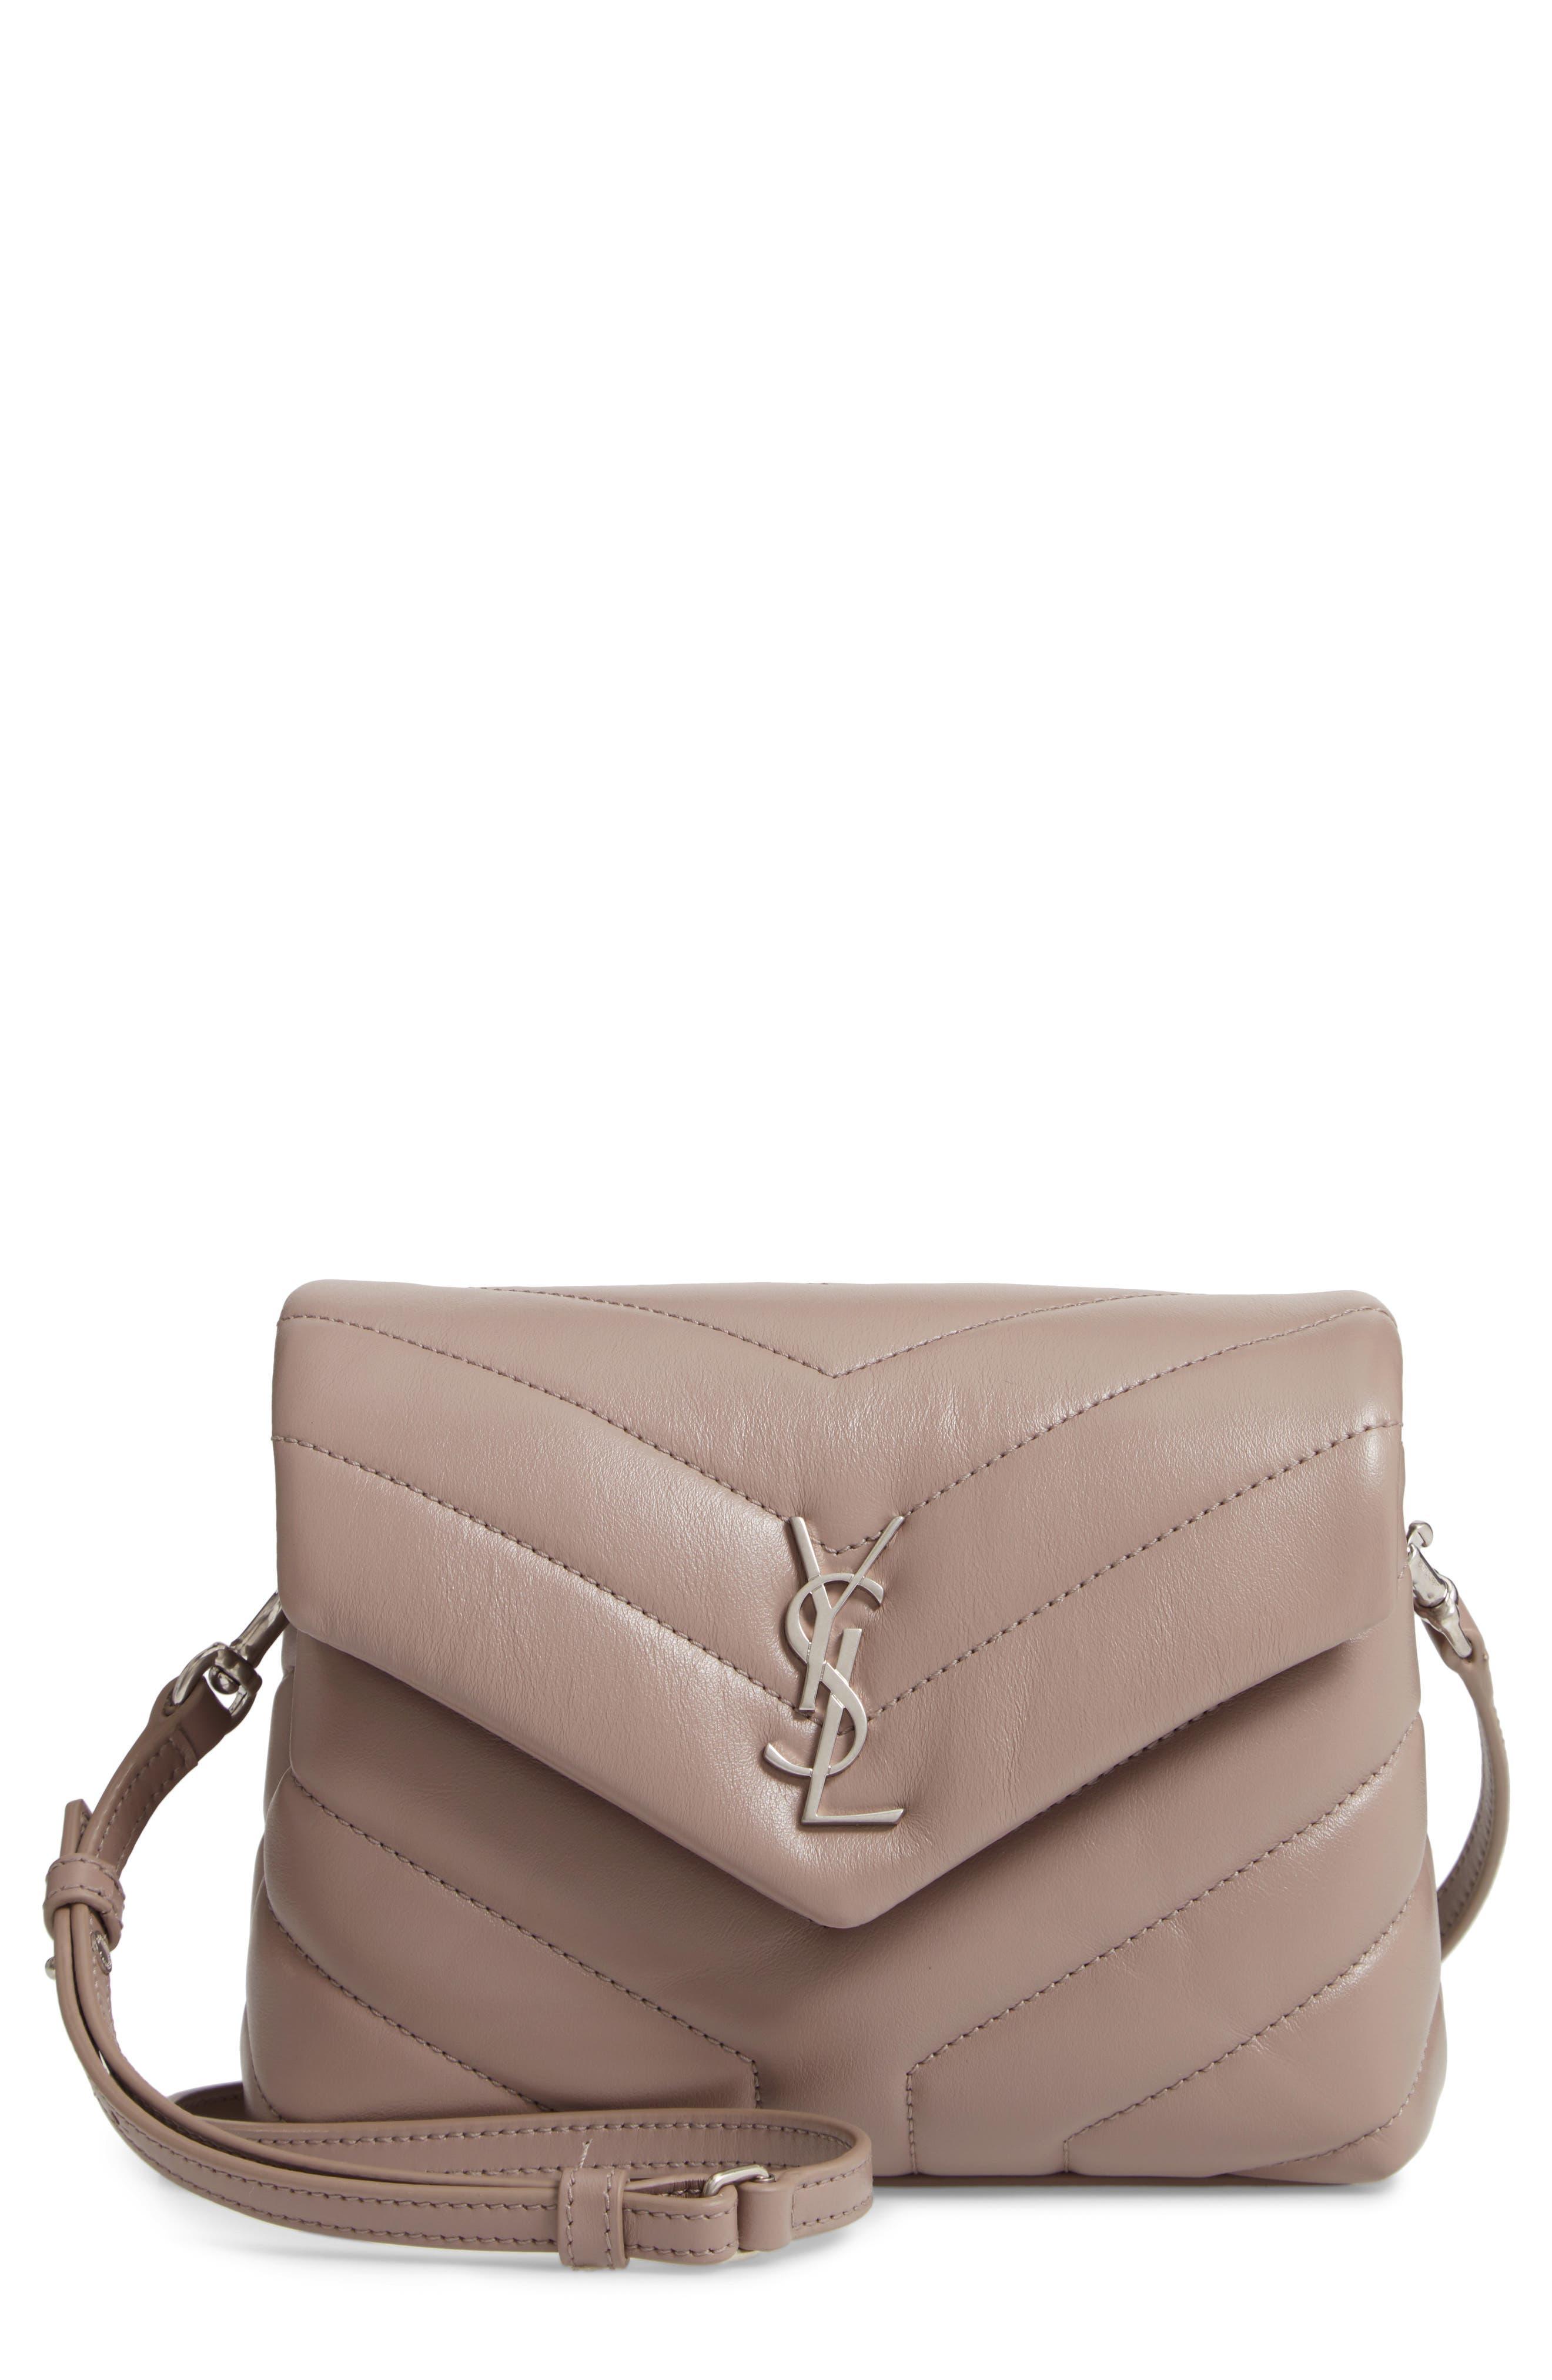 SAINT LAURENT Toy Loulou Calfskin Leather Crossbody Bag, Main, color, MINK